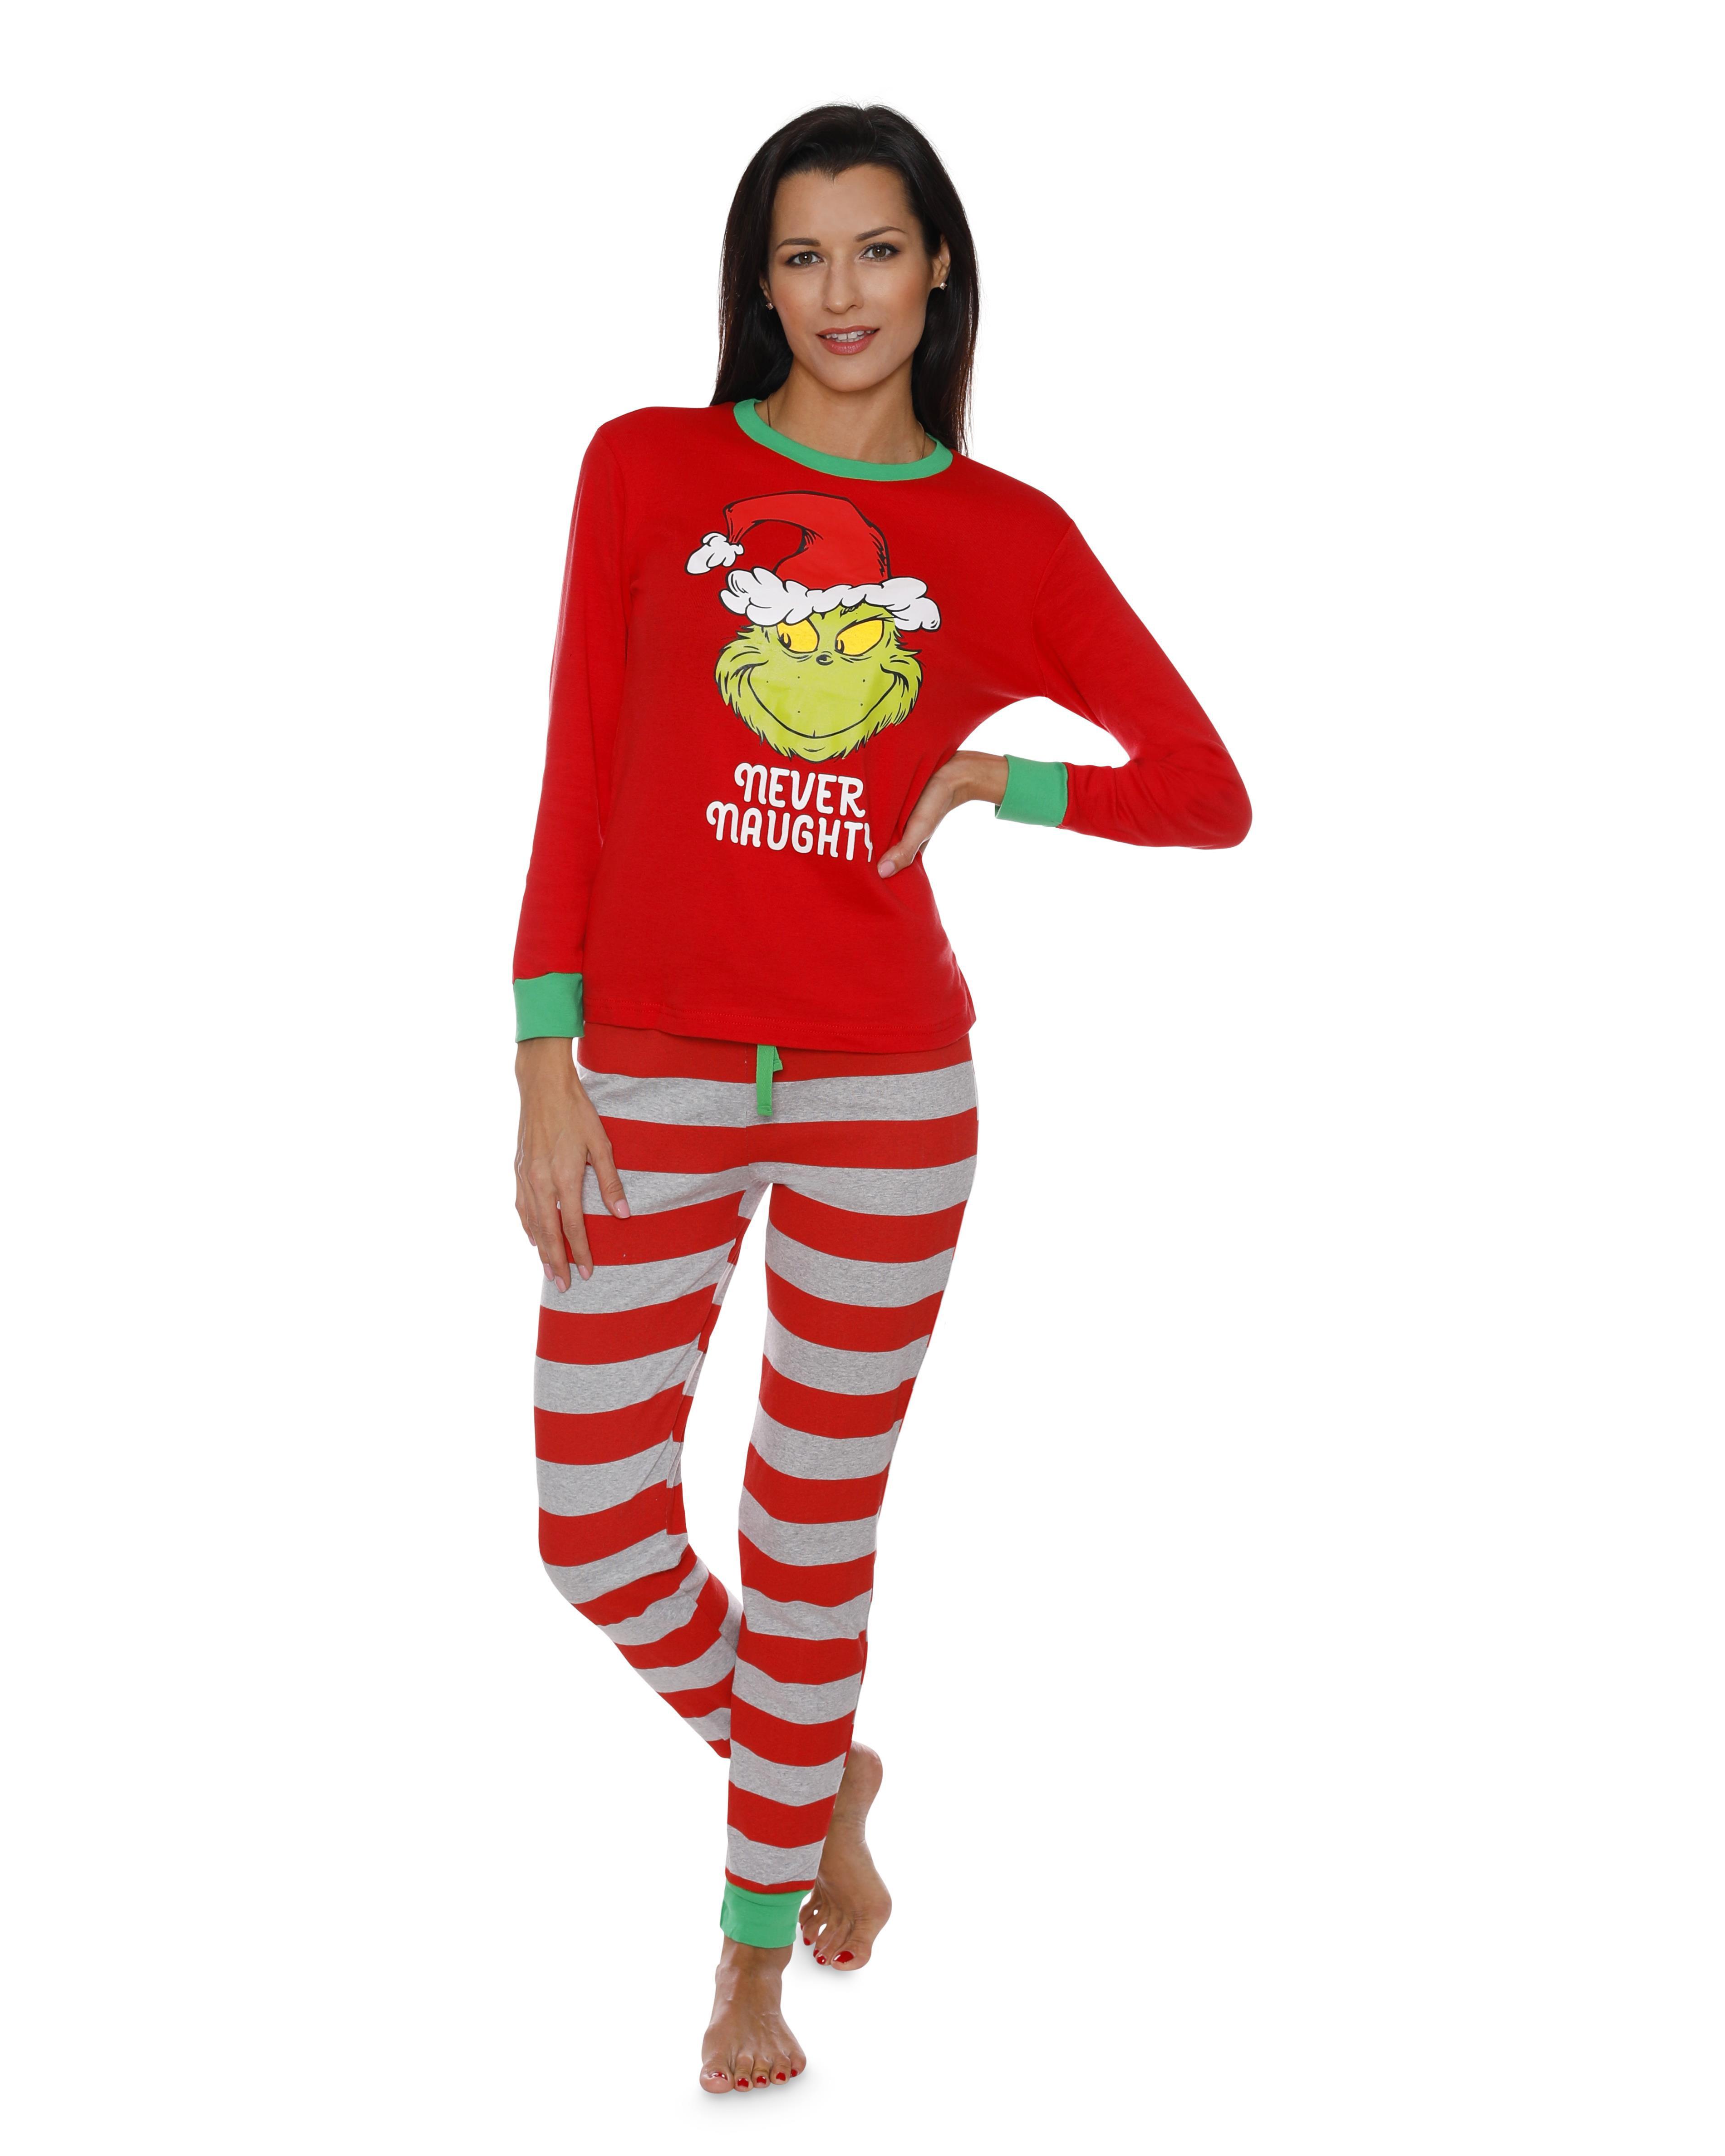 fc956e79cd1b Dr. Seuss Holiday Grinch Pajamas Cotton - Family Christmas Pajamas ...